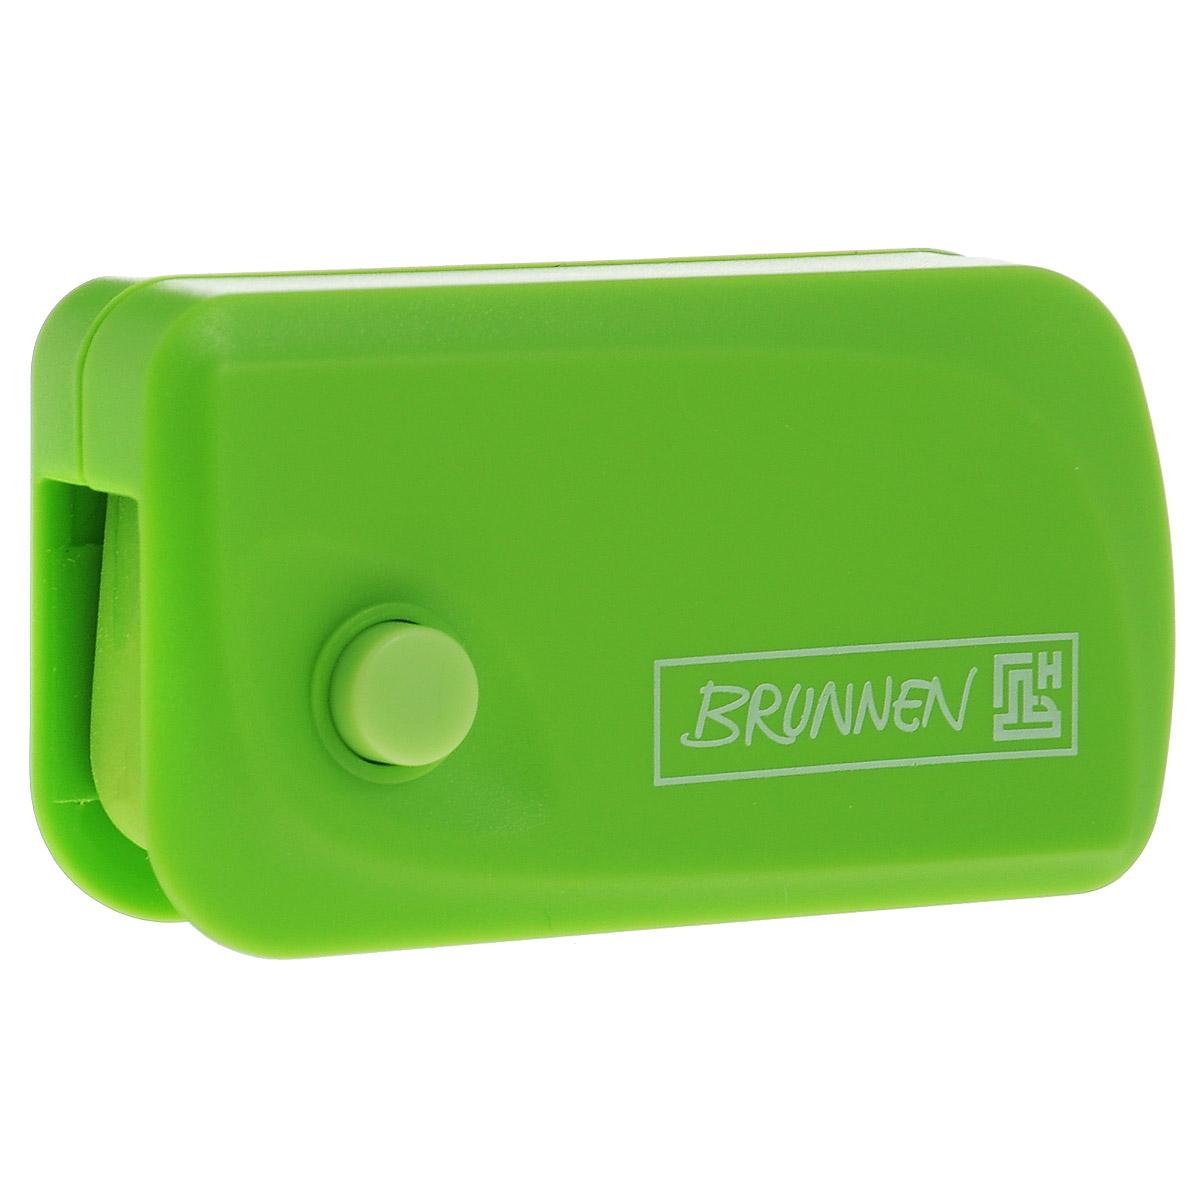 "Brunnen Ластик ""Клик"", цвет: зеленый 29967-52\BCD"